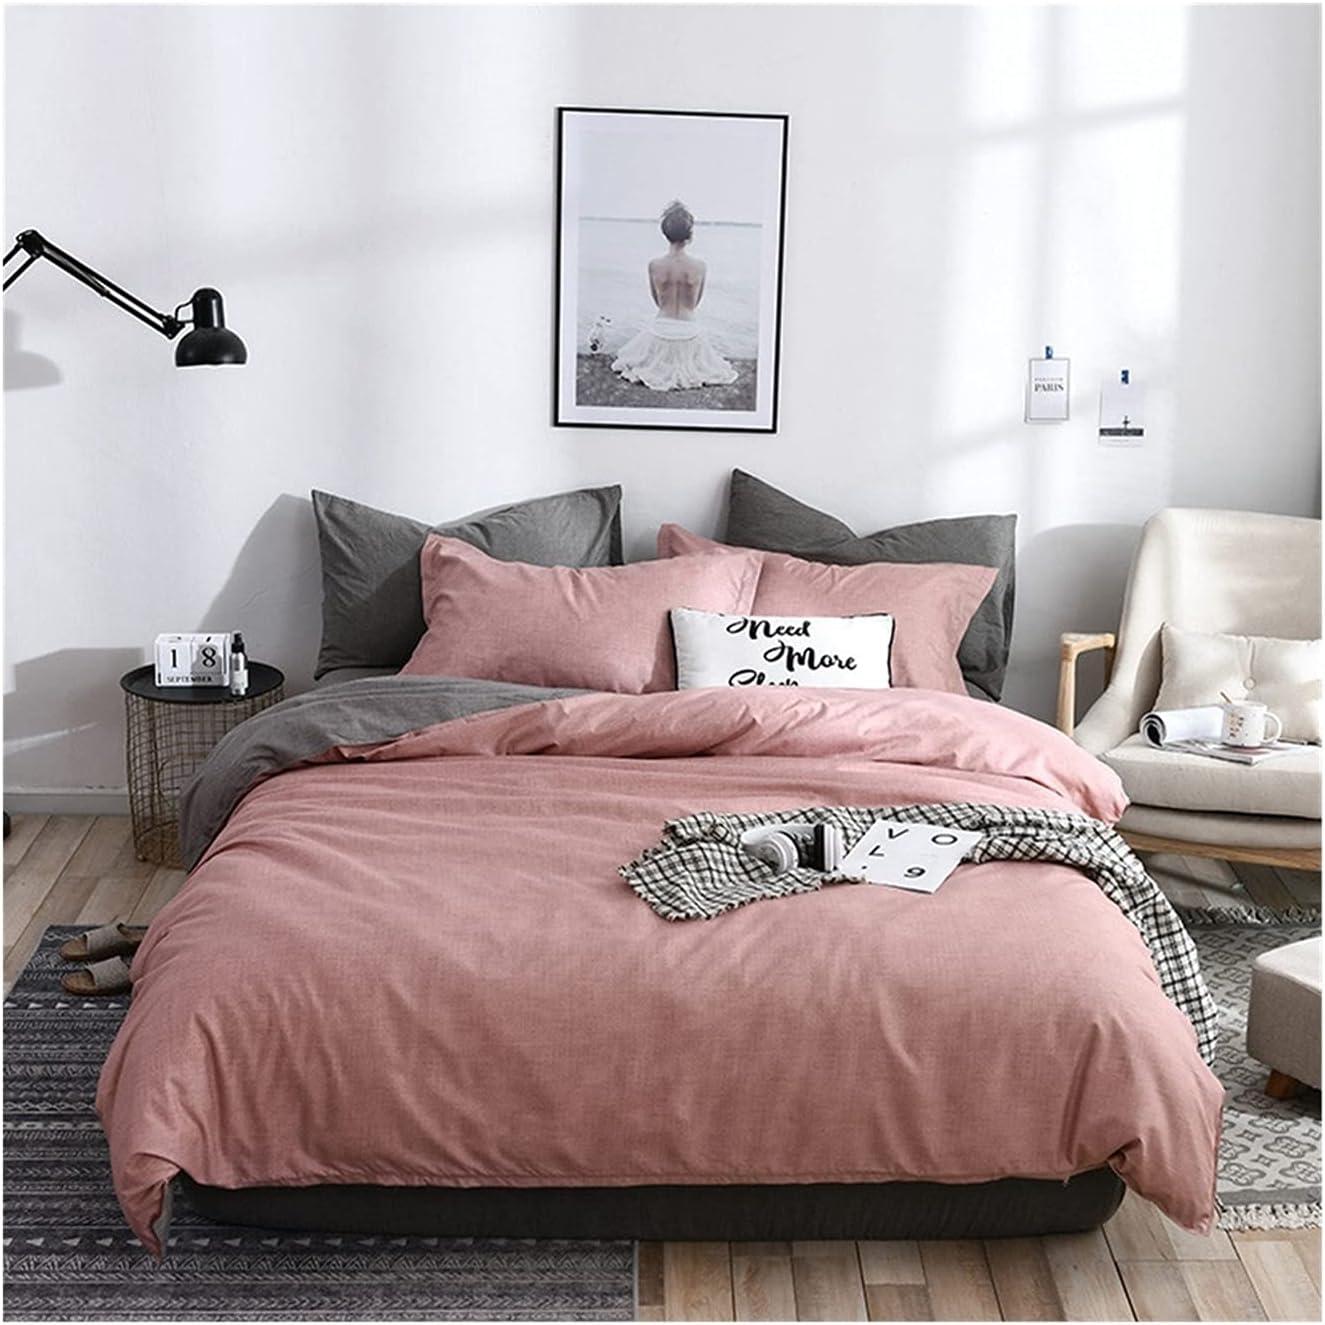 25% OFF LSDJ QMDSH Boston Mall Home Textile Girl Bedding Duvet Set Cover Peach Pink